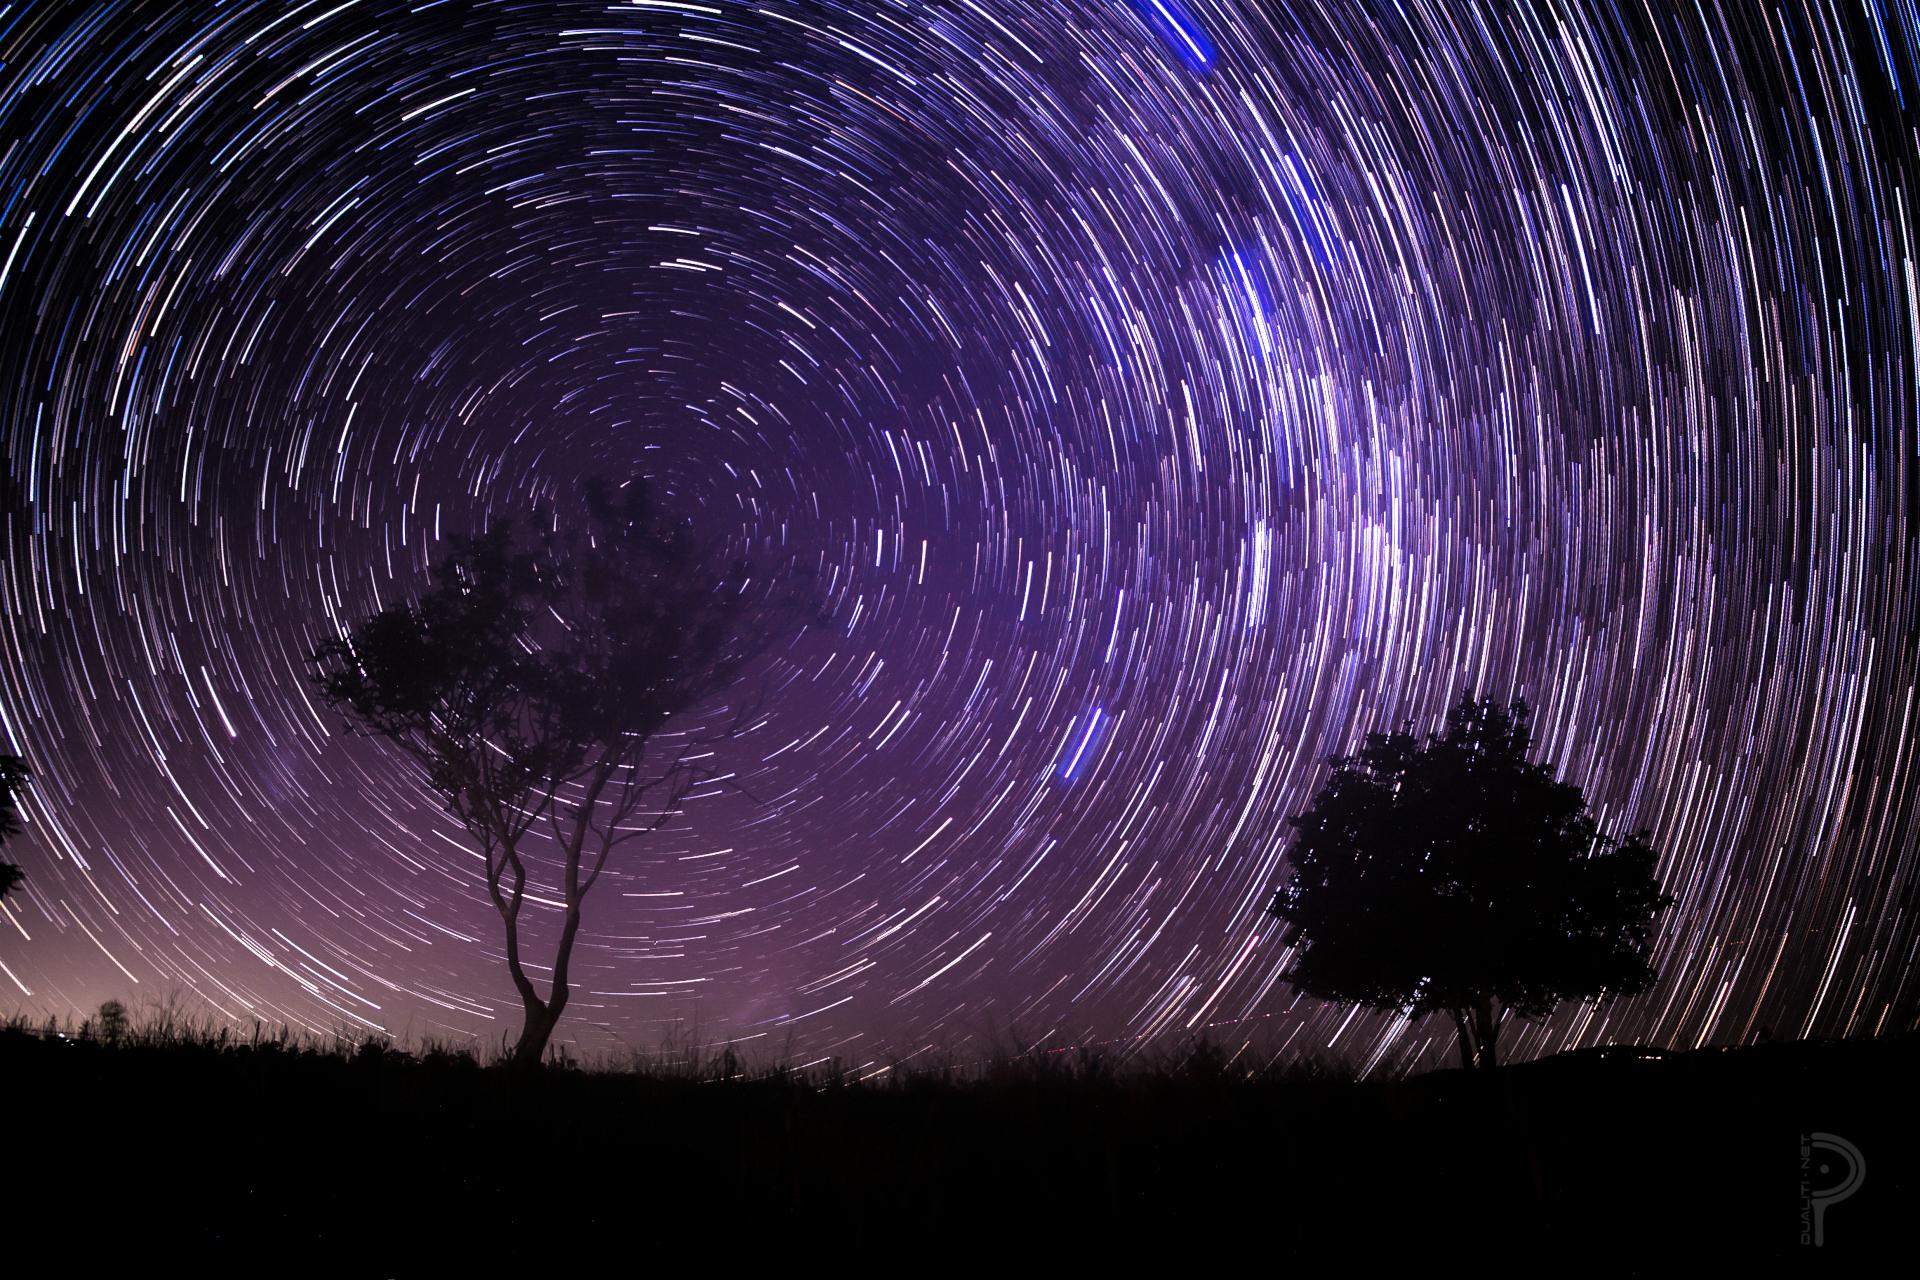 wallpaper : night, hill, sky, purple, silhouette, stars, coast